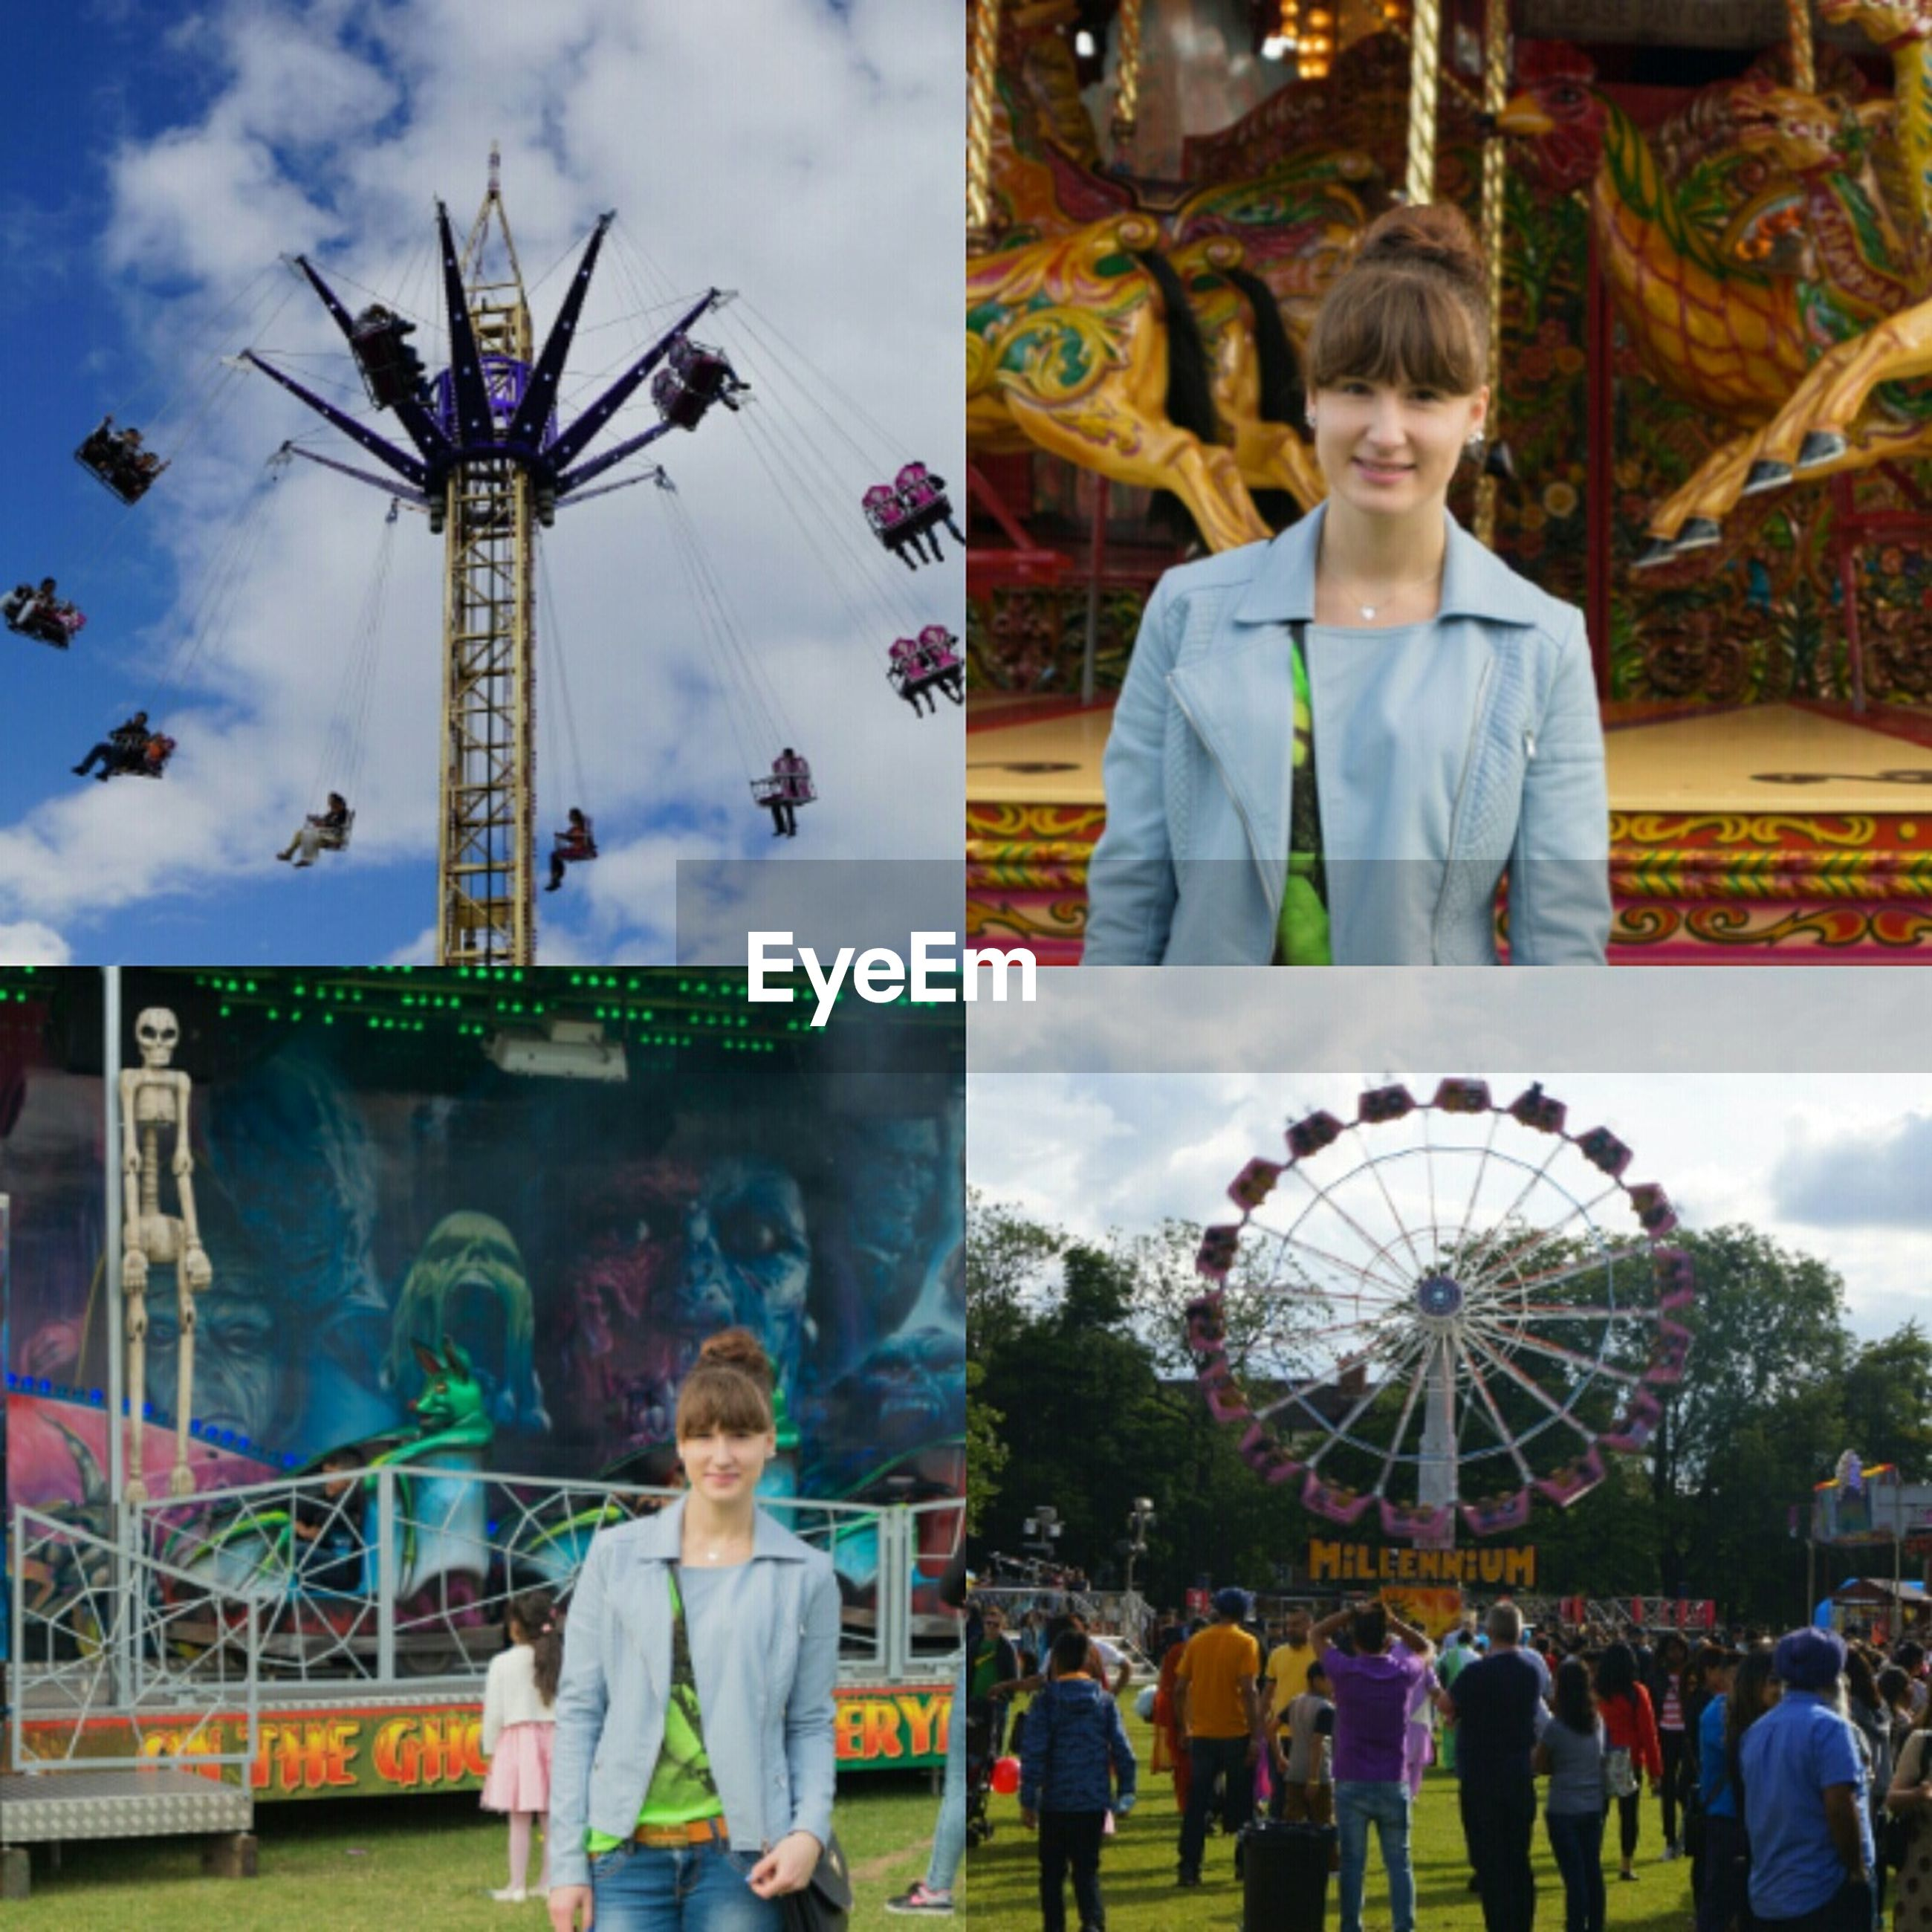 amusement park, leisure activity, lifestyles, amusement park ride, arts culture and entertainment, ferris wheel, sky, casual clothing, enjoyment, fun, standing, person, men, built structure, large group of people, cloud - sky, happiness, architecture, tourism